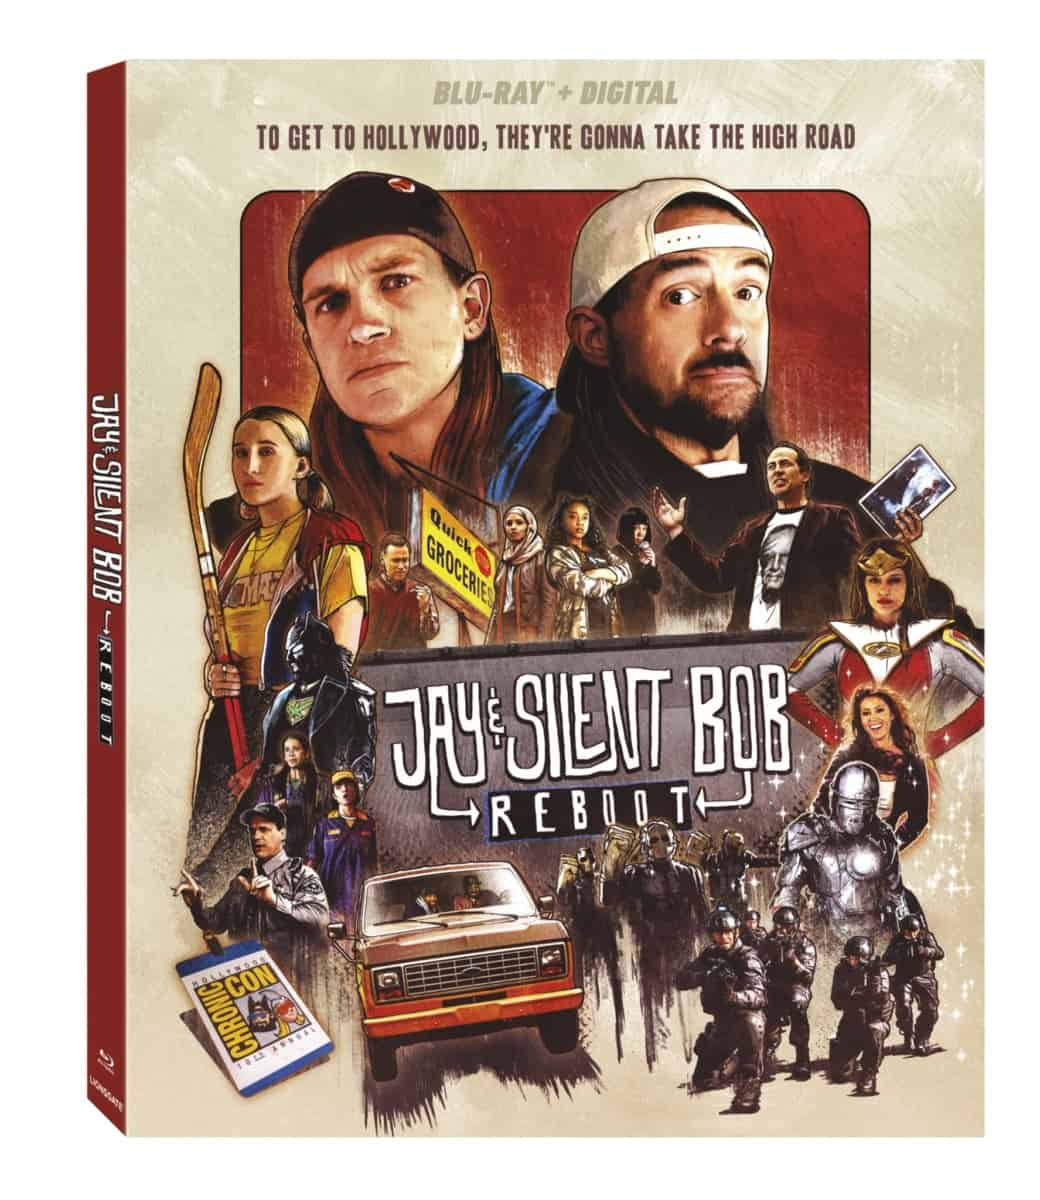 Jay and Silent Bob Reboot Blu-ray digital